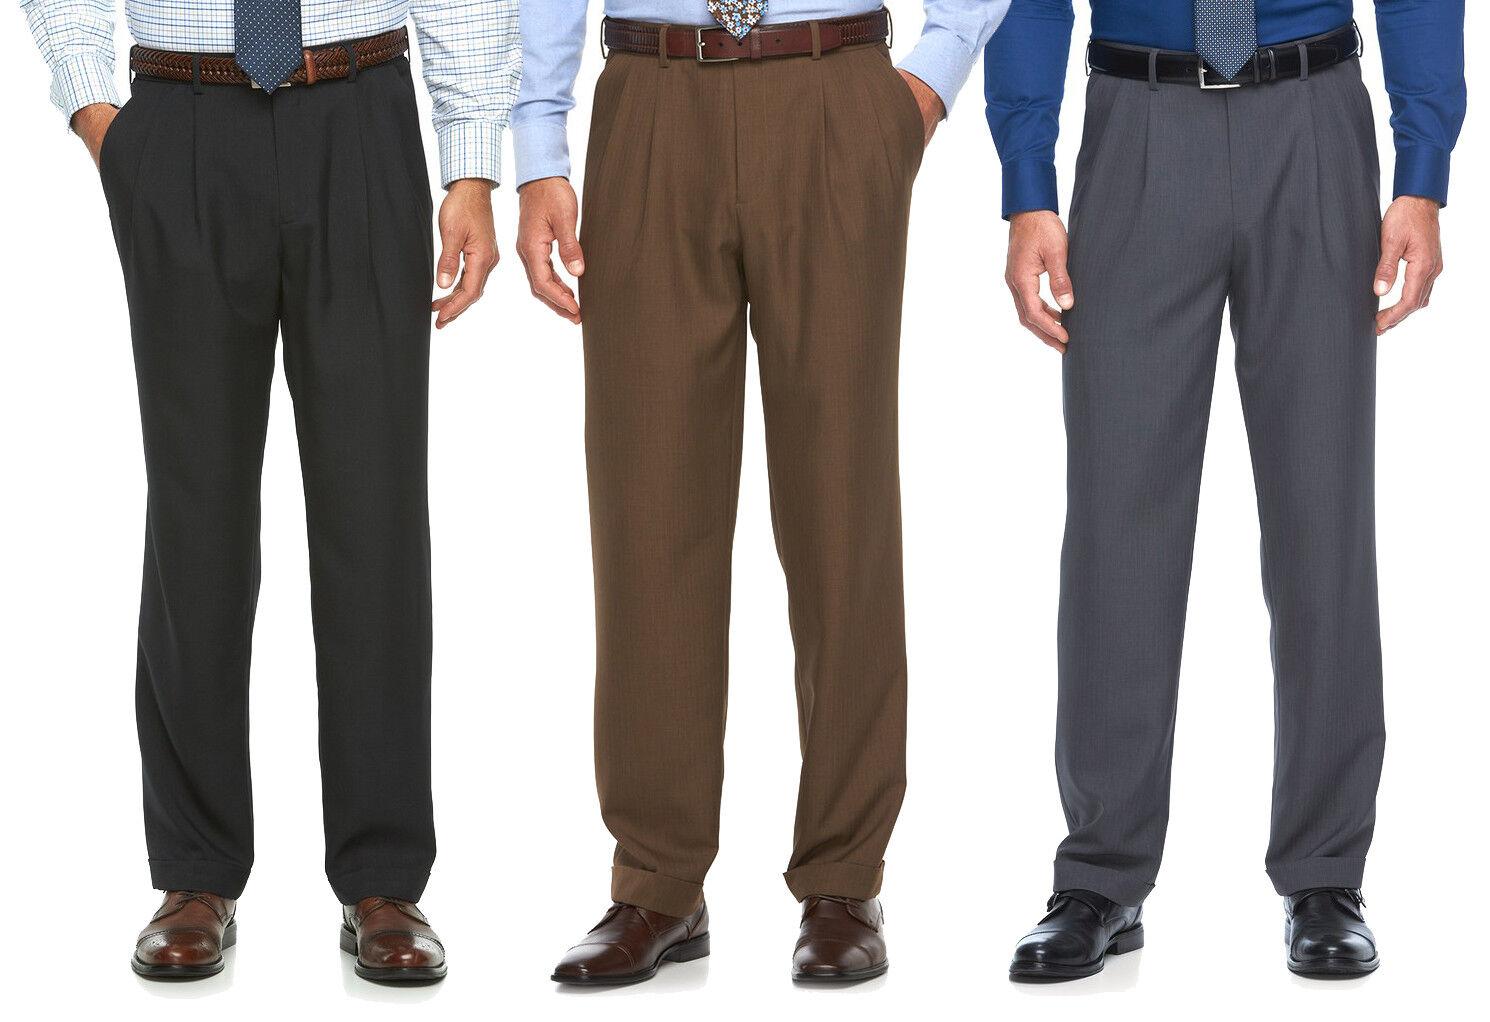 New Croft&Barrow Men's Comfort Opticool Pleated Dress Pants